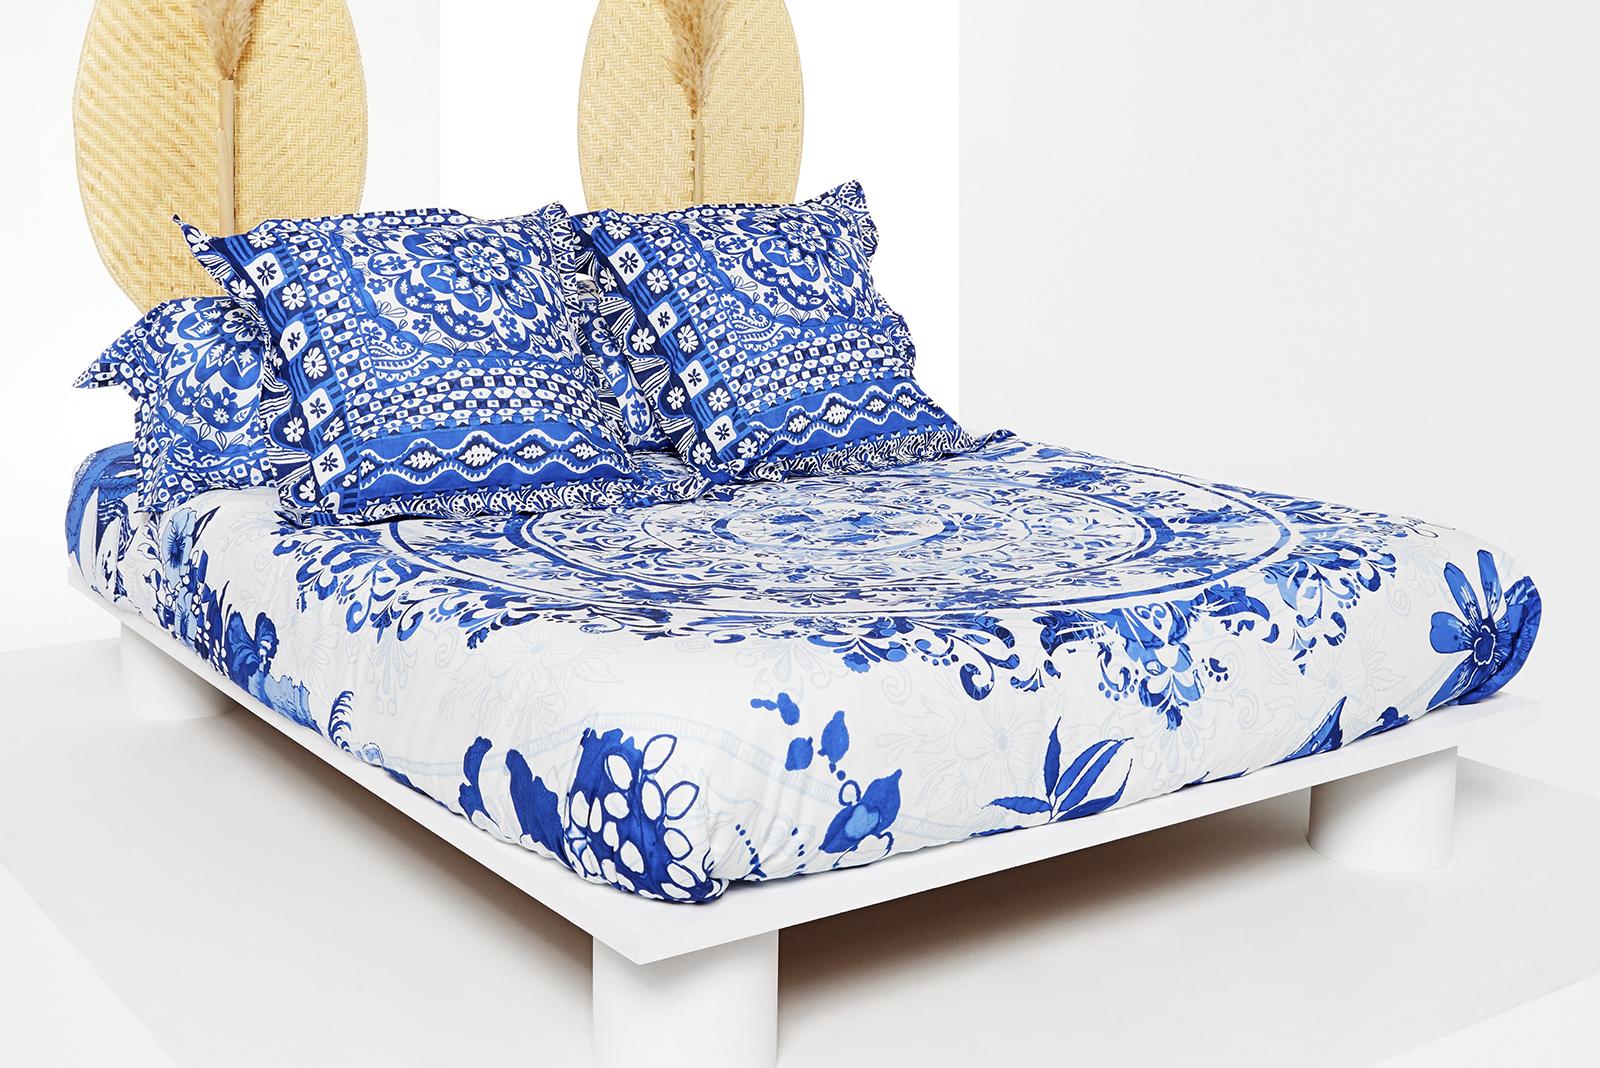 Ropa de cama Desigual modelo vegetal azul